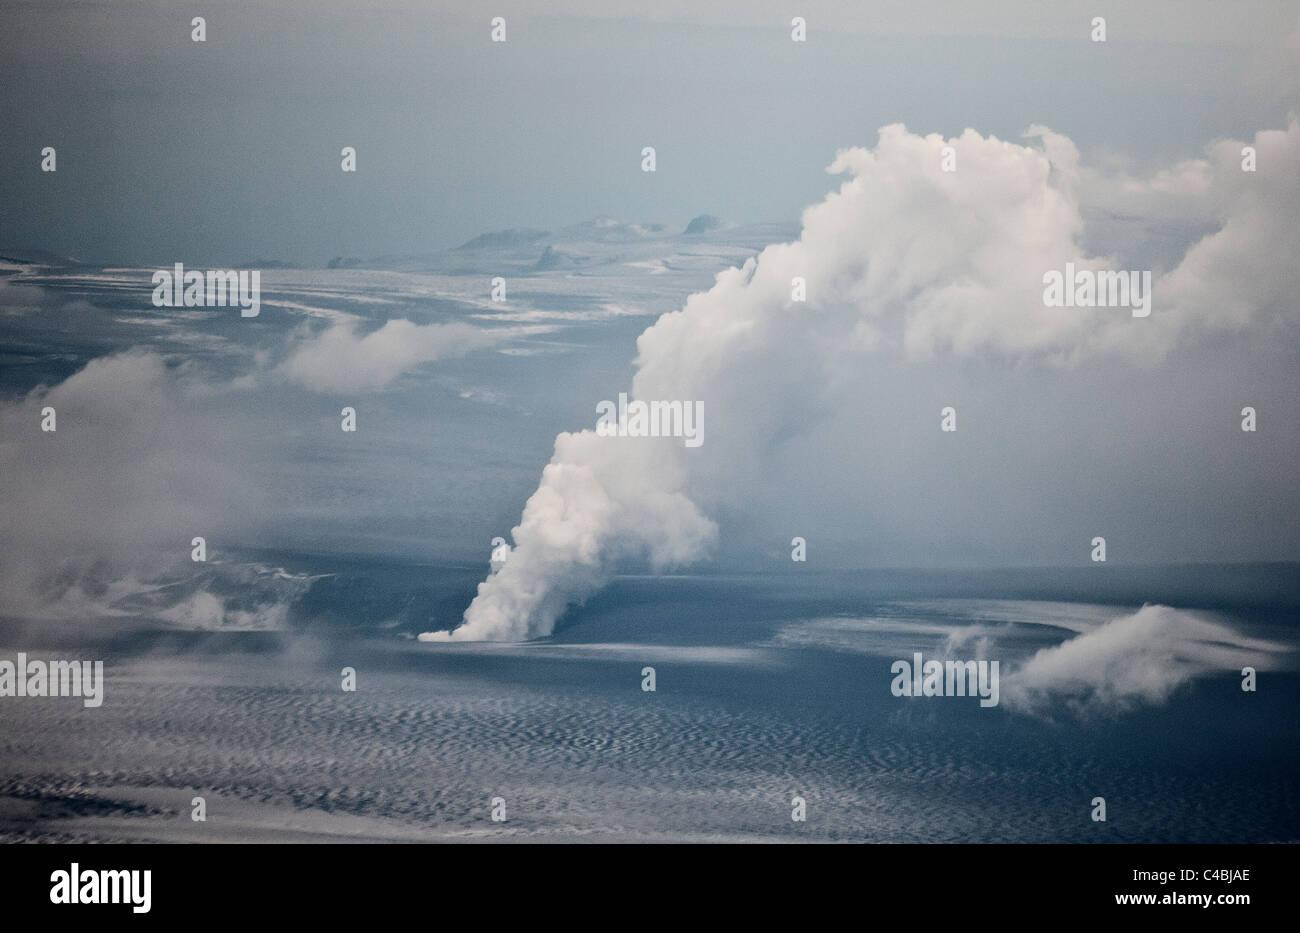 Grimsvotn Volcanic Eruption in the Vatnajokull Glacier, Iceland - Stock Image